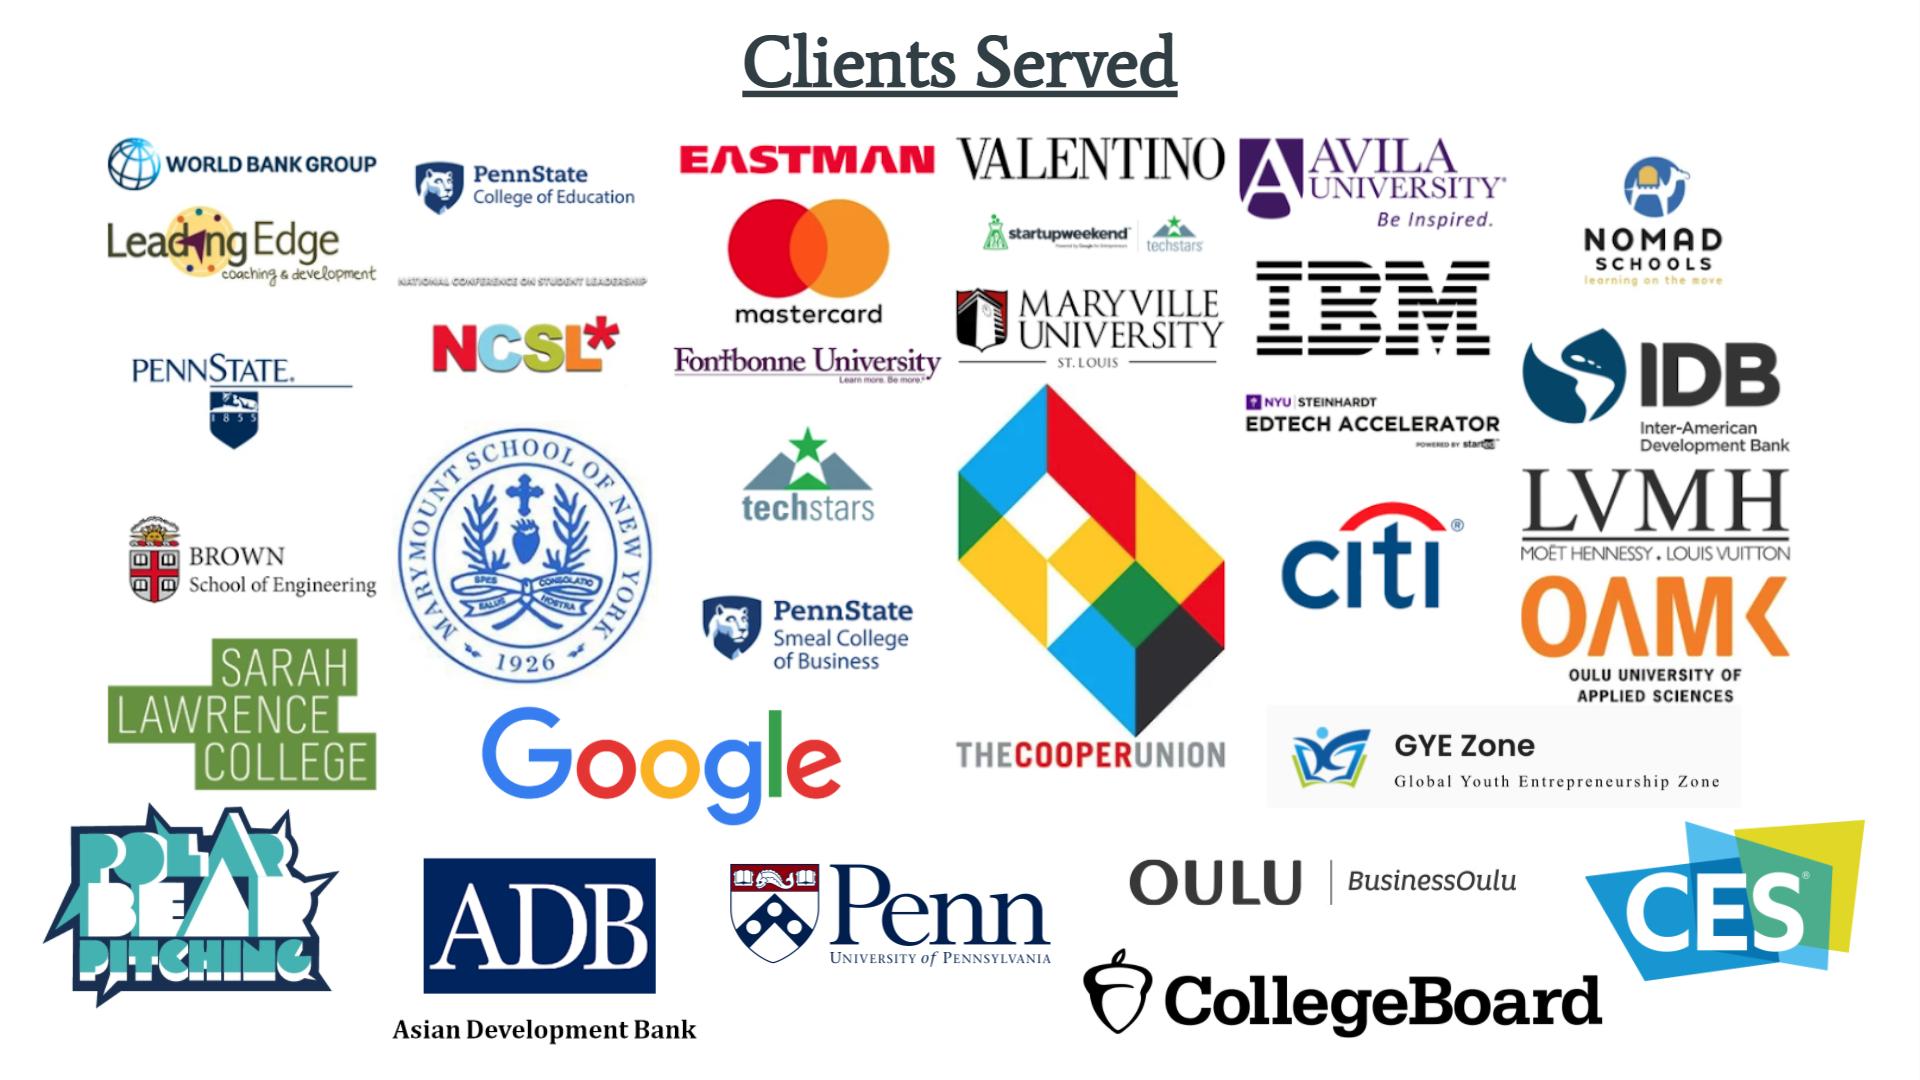 Clients served IBM Google University of Pennsylvania LVMH Penn State CES CollegeBoard Asian Development Bank World Bank Group InterAmerican Development Bank NYU Techstars